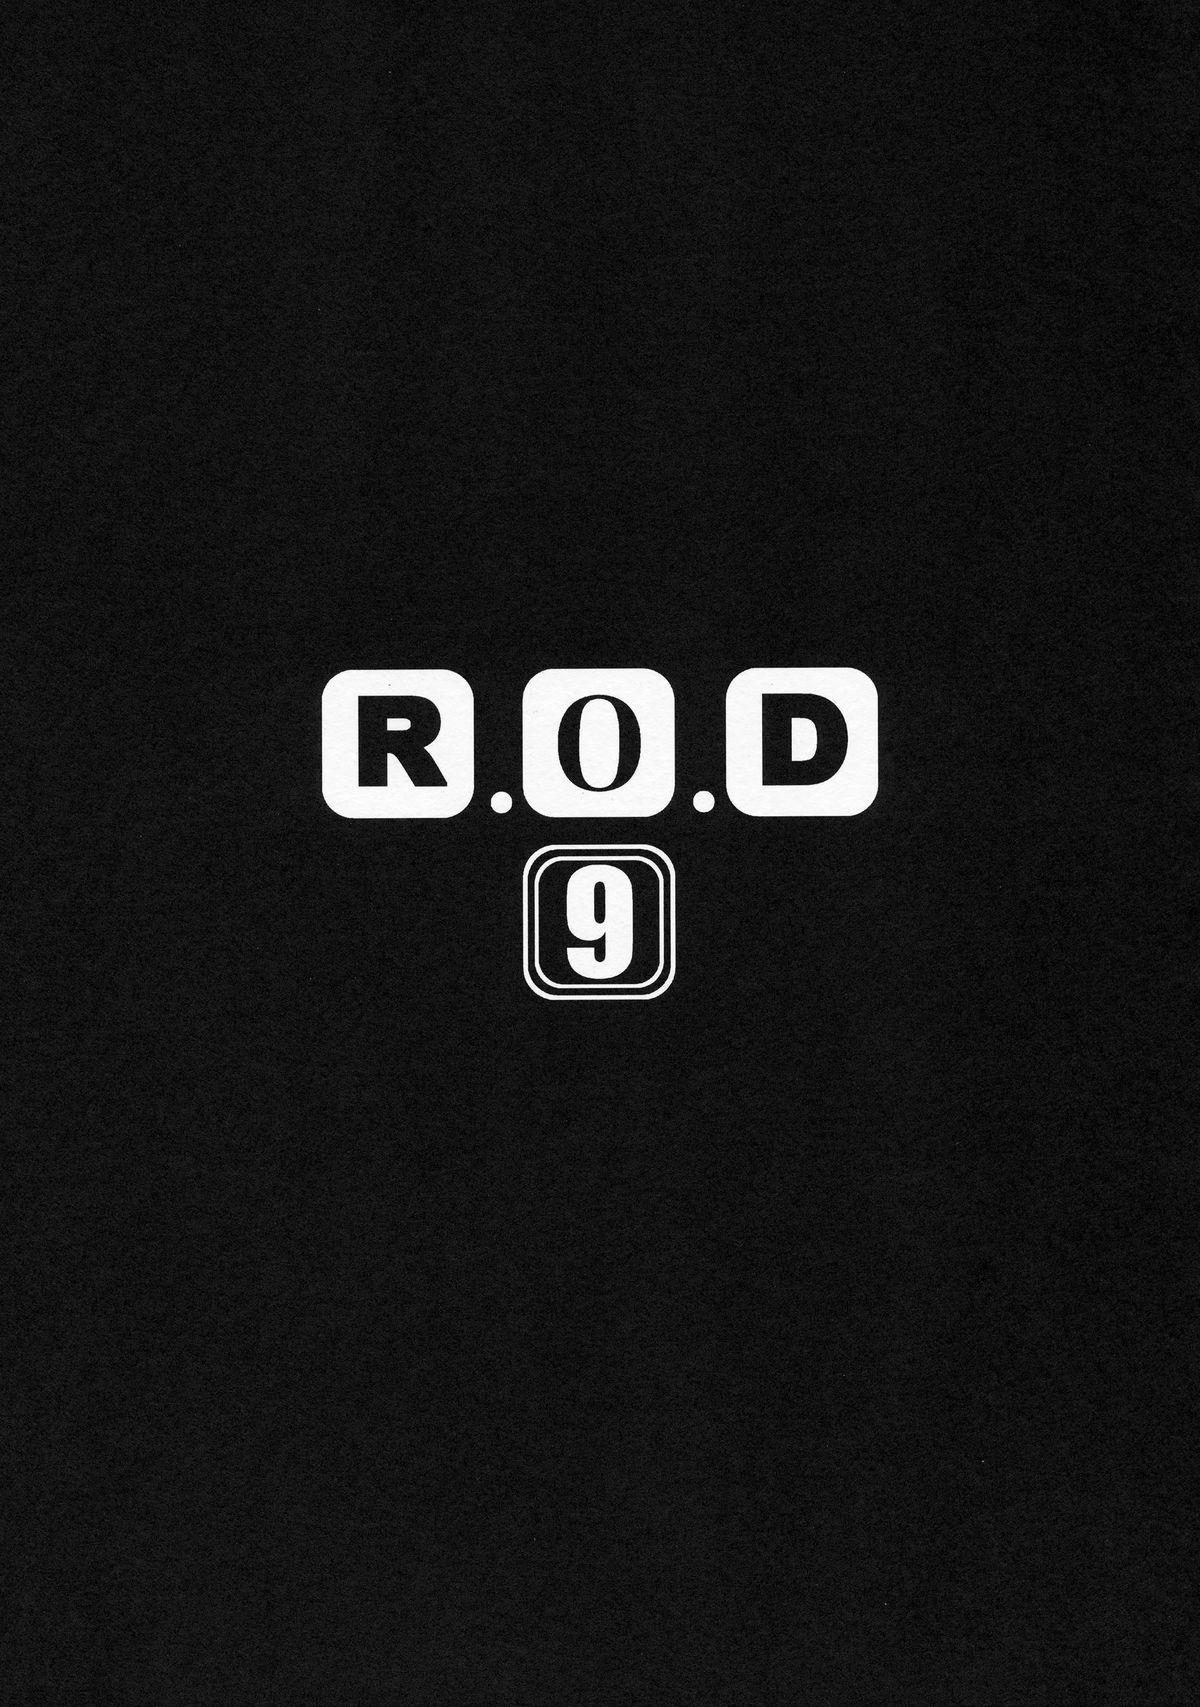 R.O.D 9 5